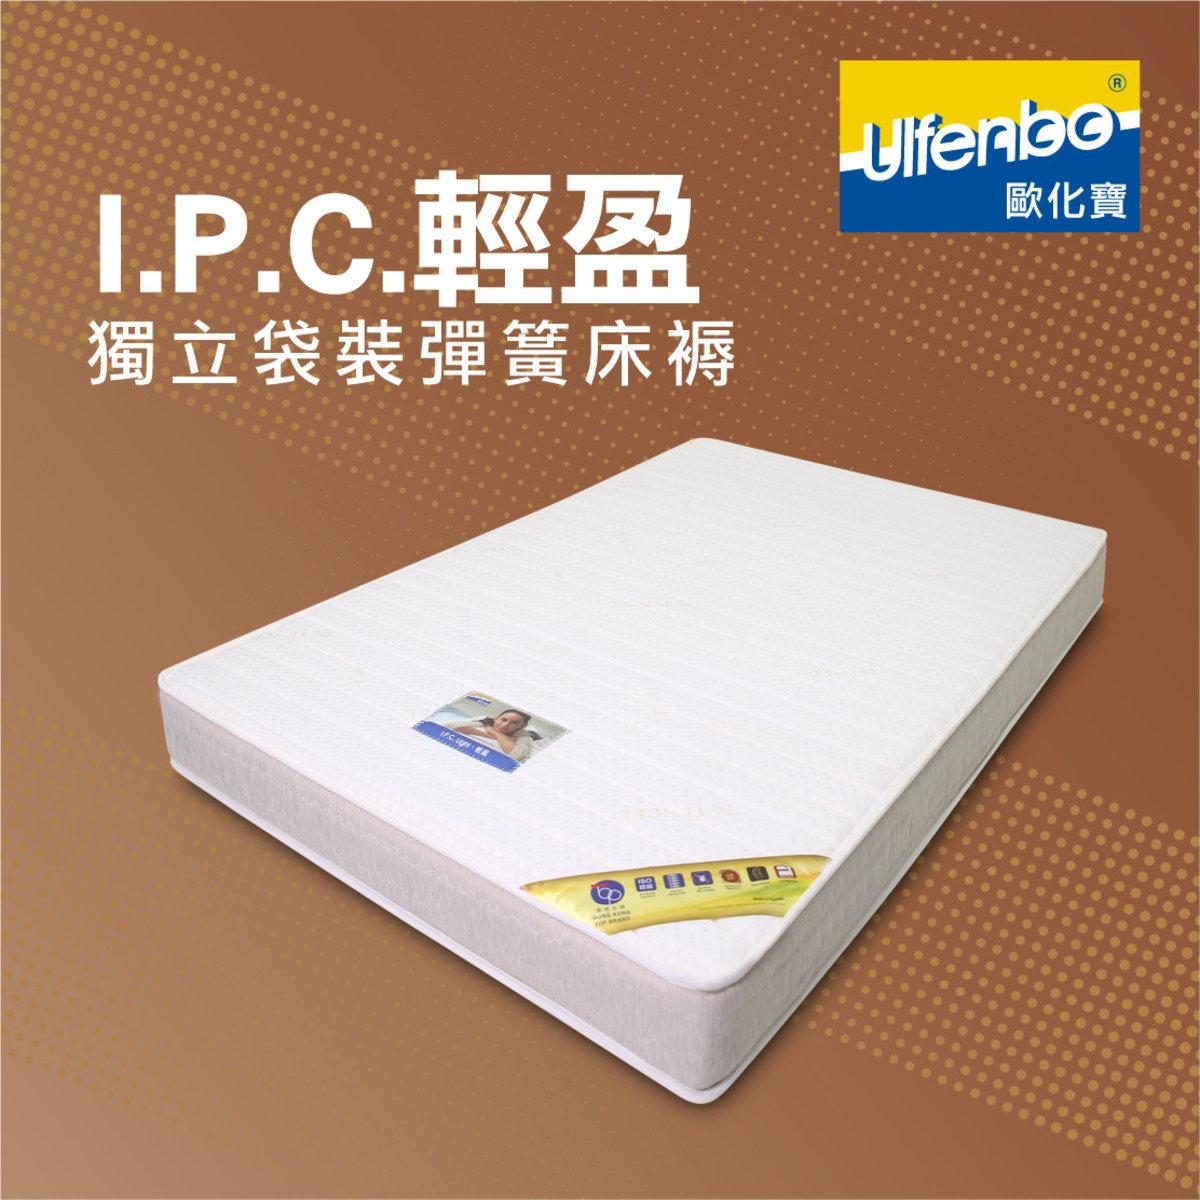 I.P.C. Light Premium Spring Mattress (MOQ6301AS)